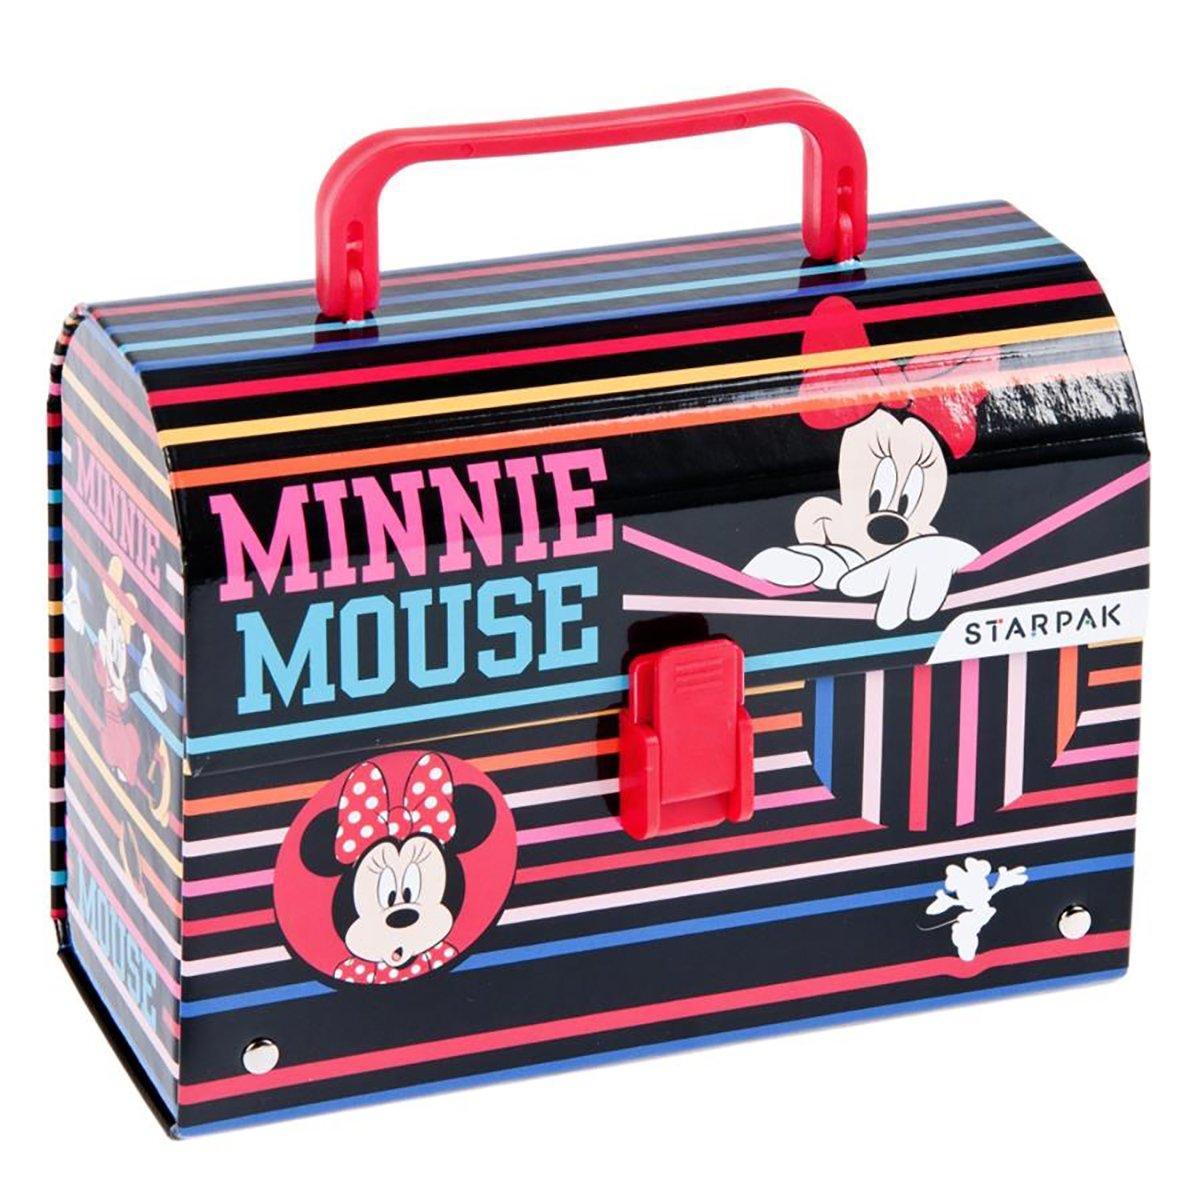 Servieta cu maner Starpak, Disney Minnie Mouse